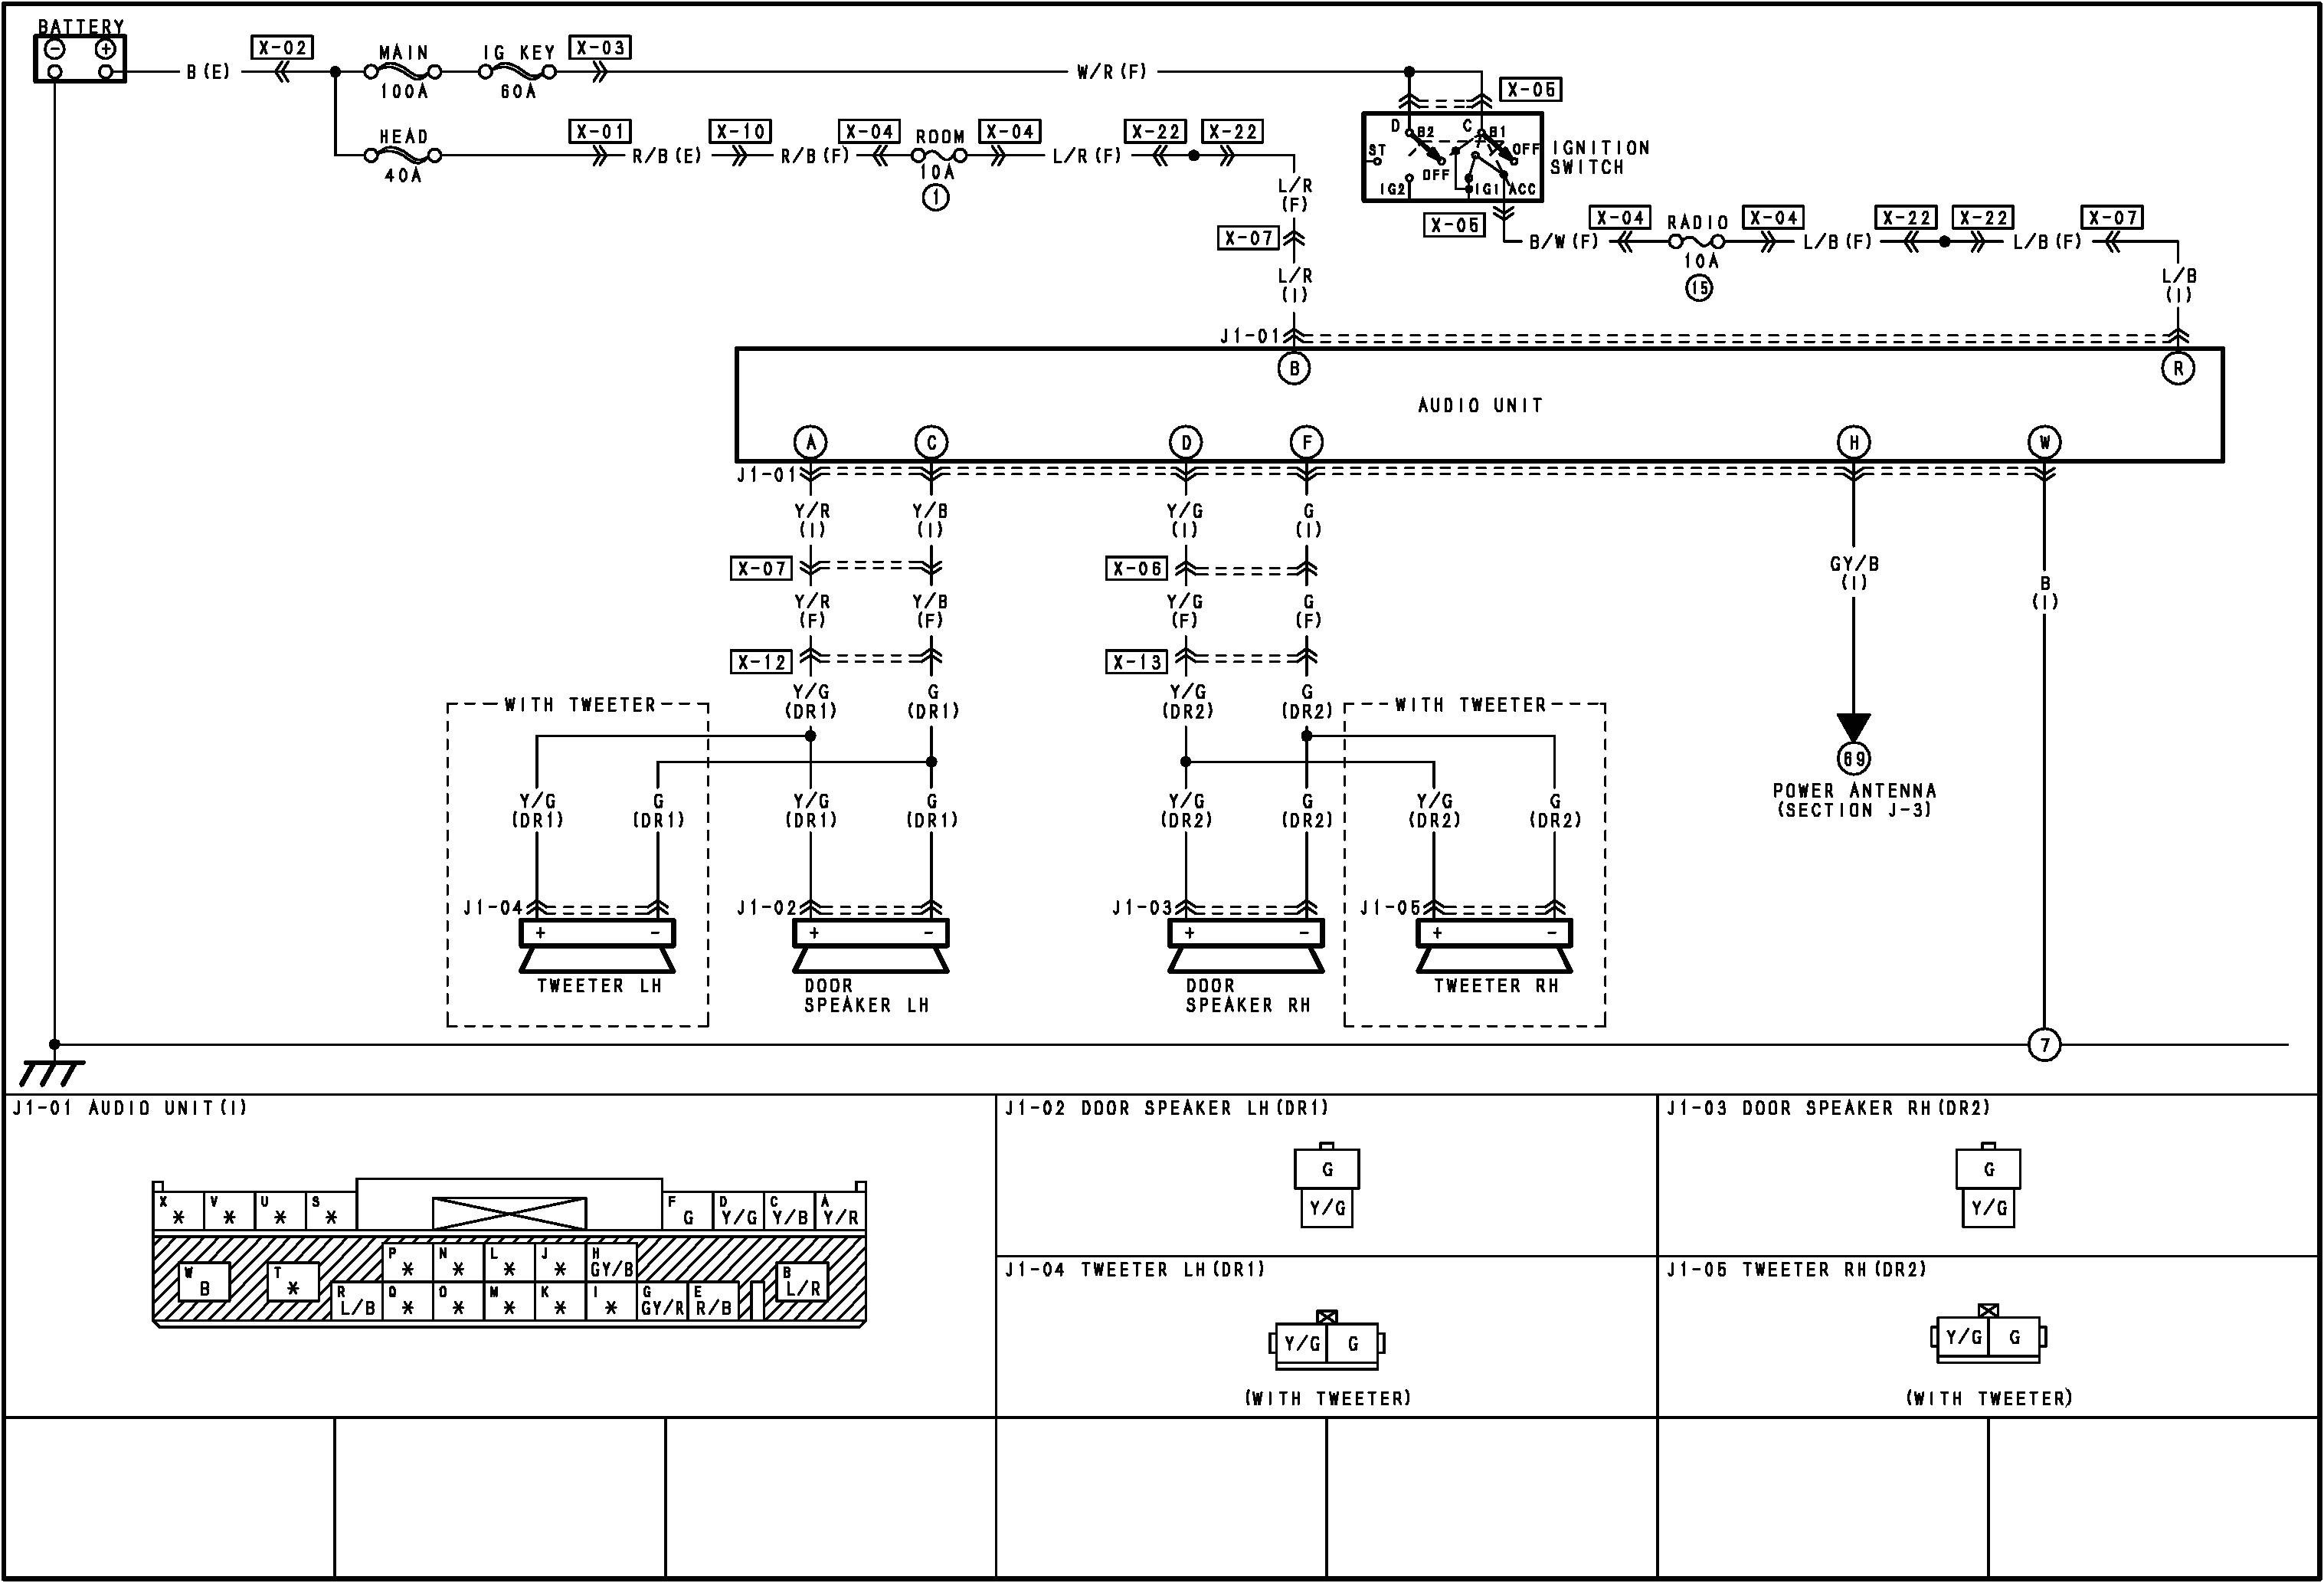 1990 miata stereo wiring diagram wiring diagram paper 1990 mazda 626 radio wiring diagram 1990 miata